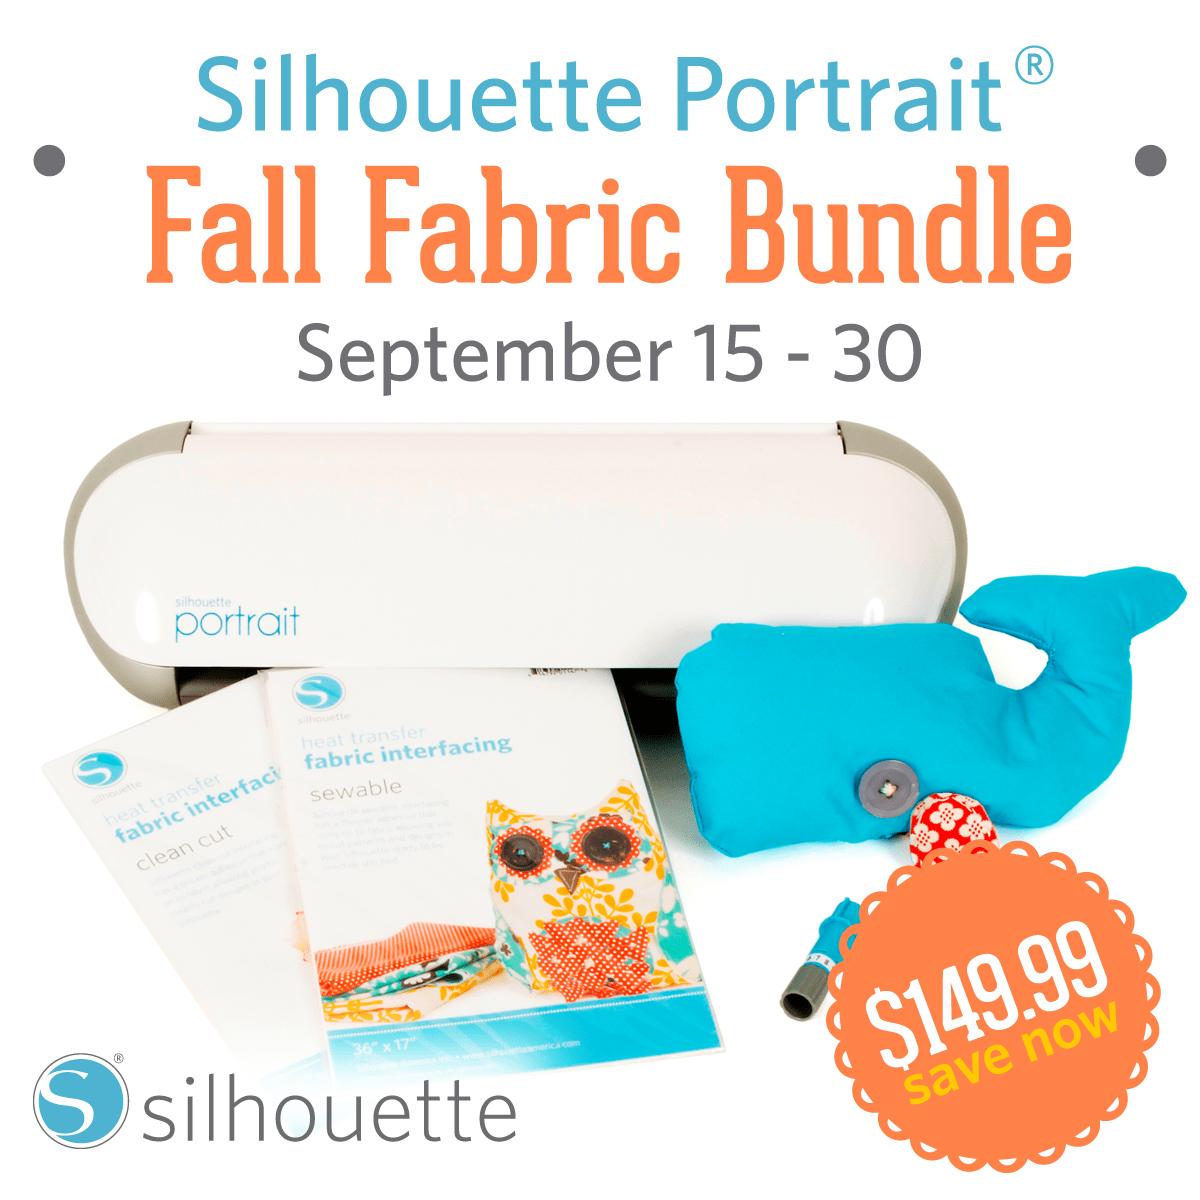 Fall Silhouette Portrait + Fabric Bundle Promotion!